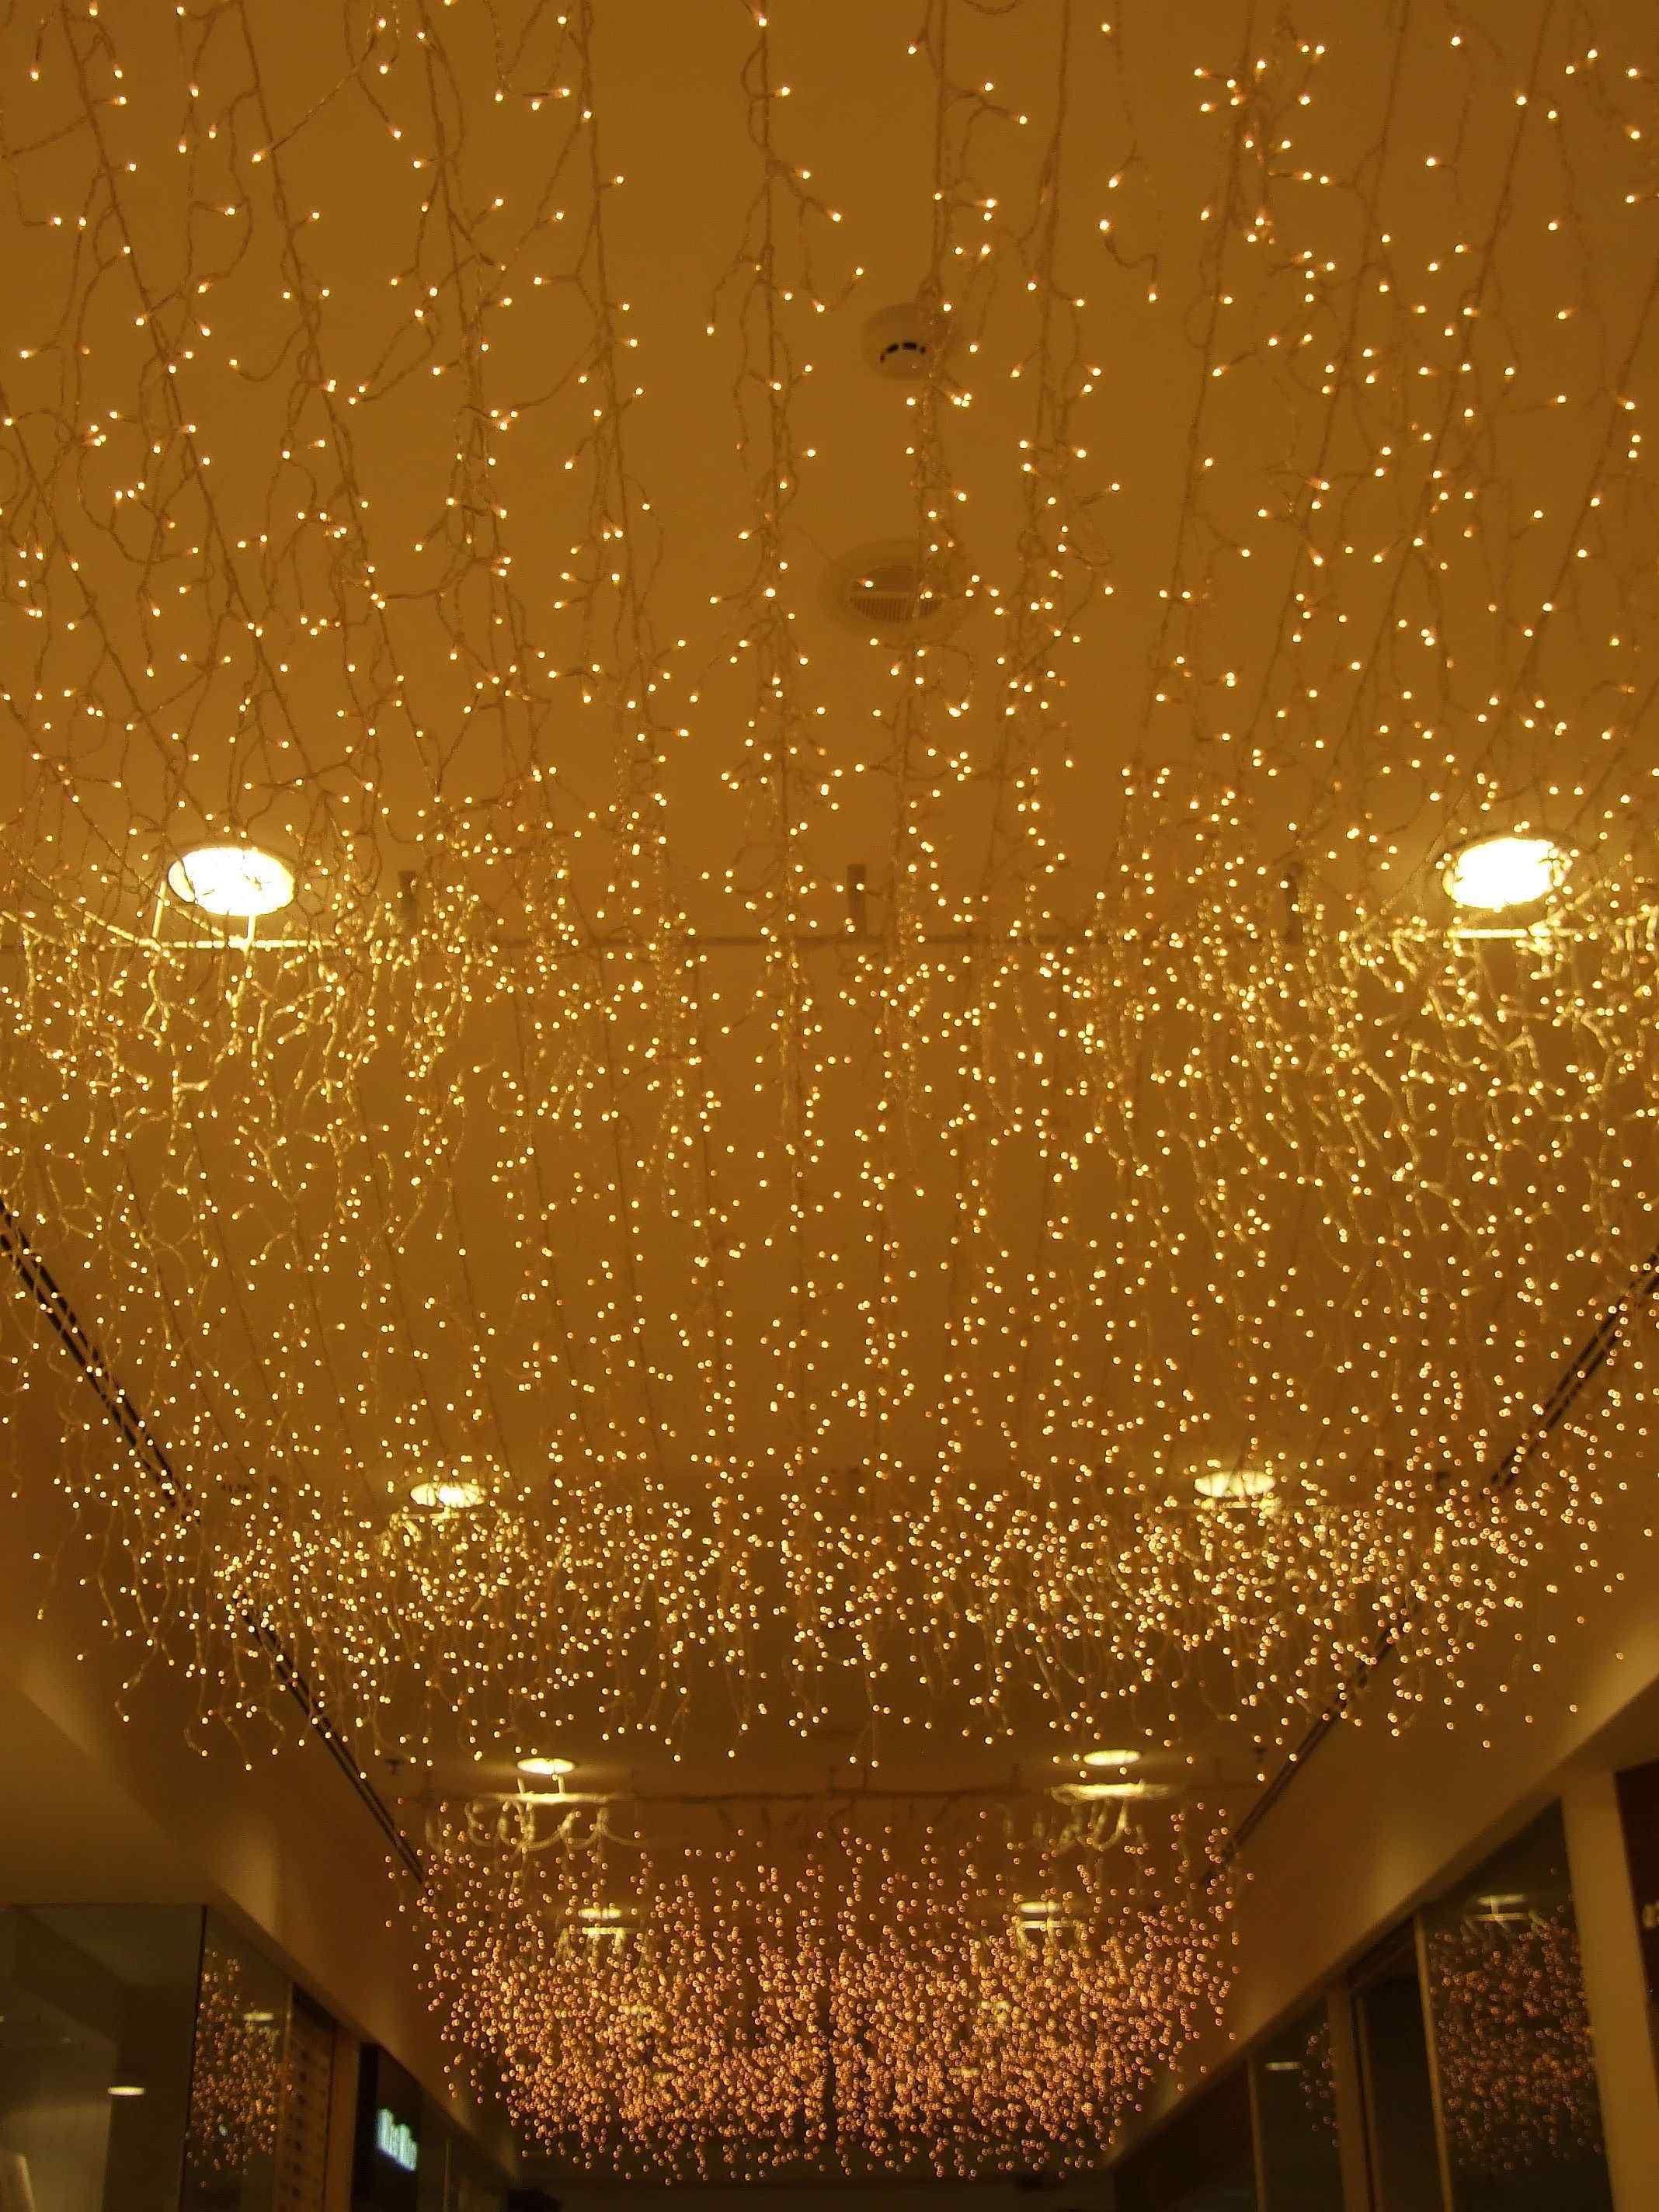 10 inspirational christmas decoration ideas for ceilings